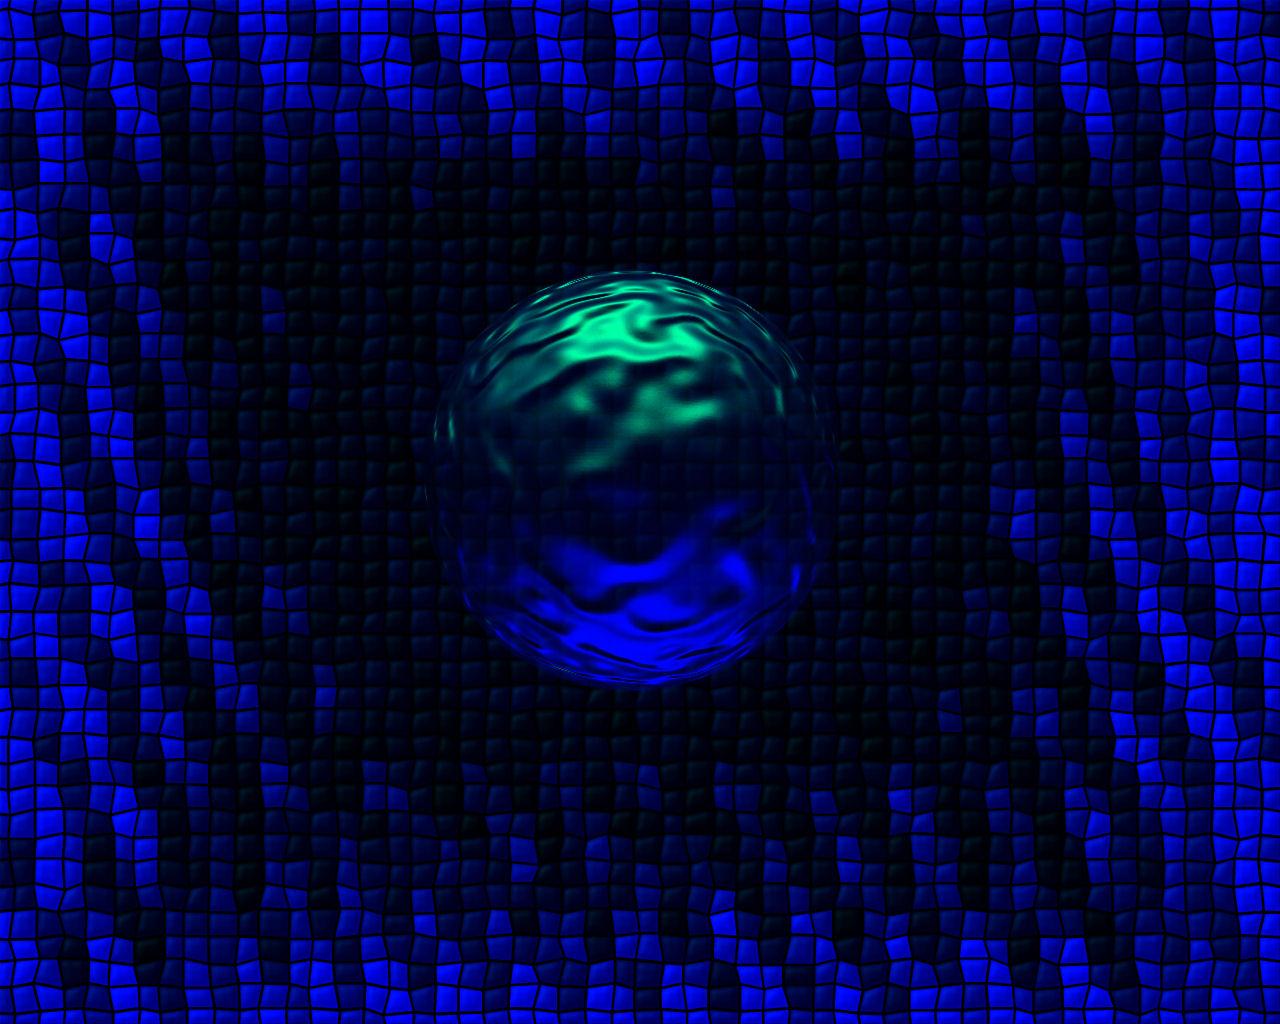 Blue 1280x1024